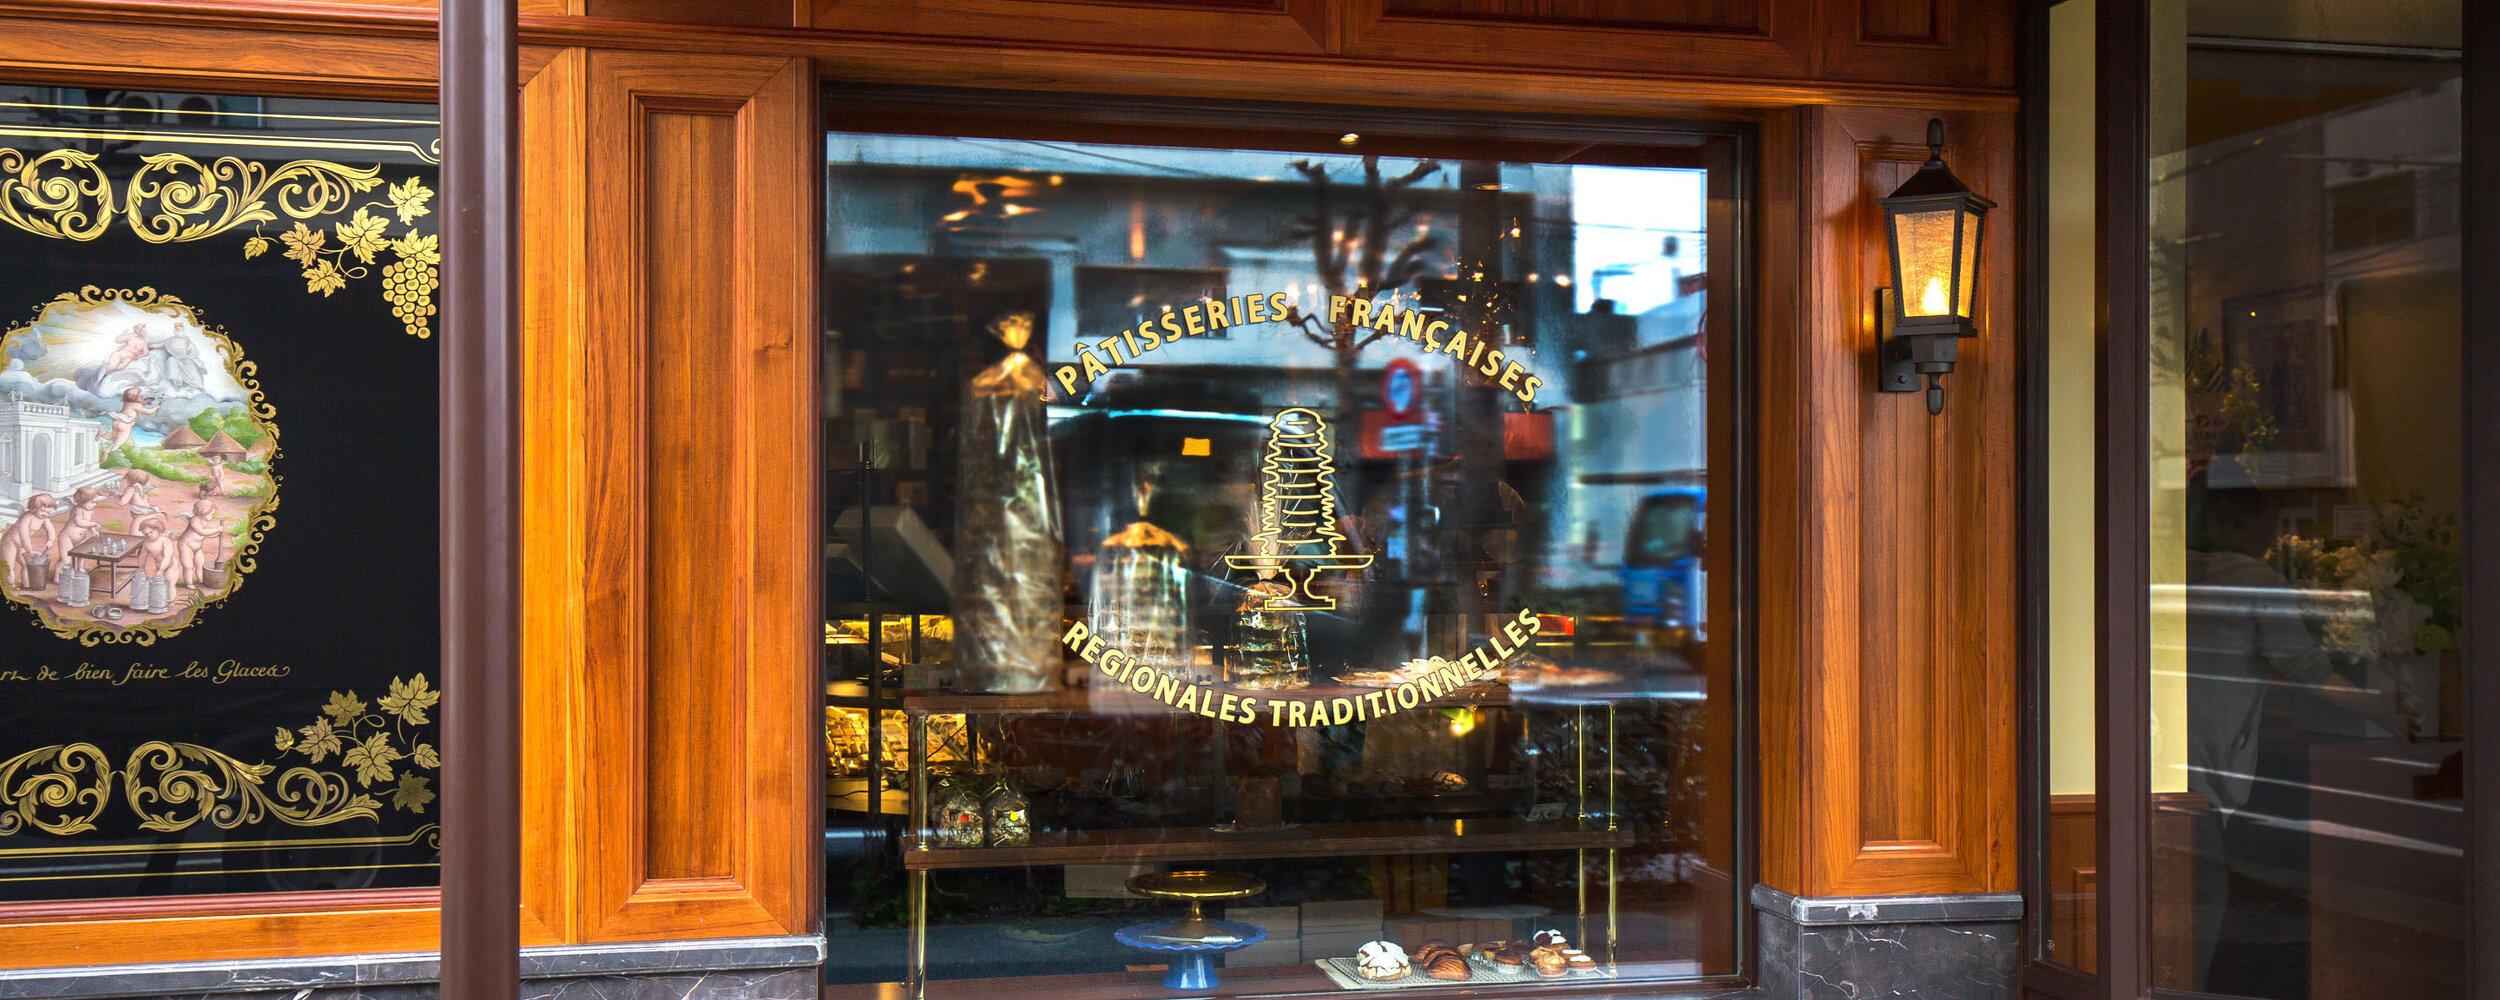 Au Bon Vieux Temps 在東京等等力的本店,再現了法國各地各種類型的甜點,被譽為「法國甜點博物館」。照片來源: Au Bon Vieux Temps官網 。